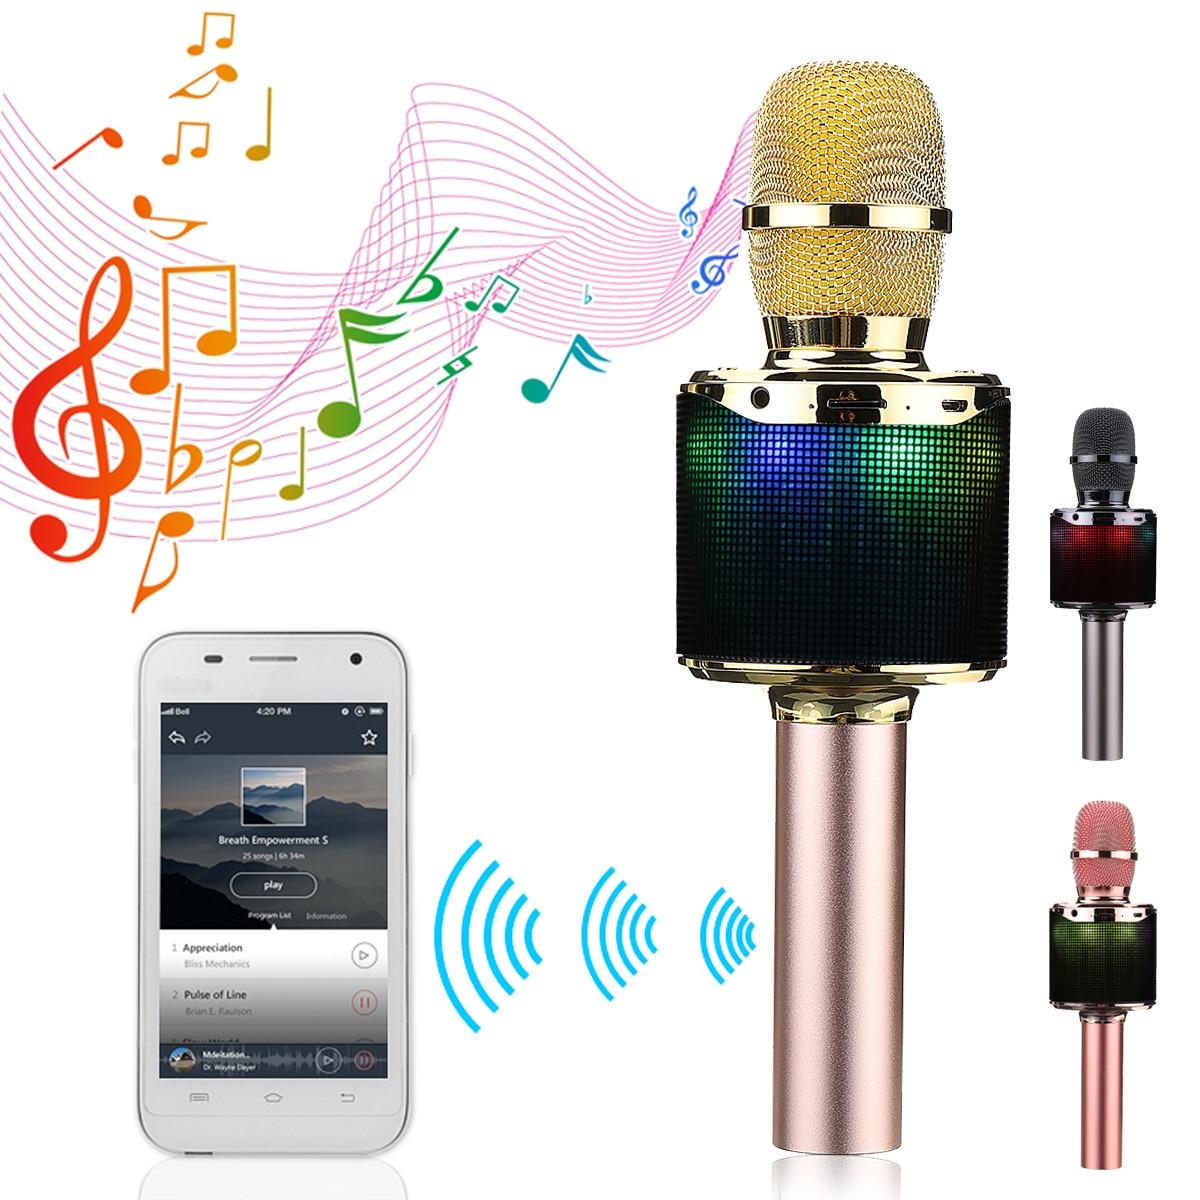 Wireless K318 Bluetooth Backlit Condenser Microphone KTV Karaoke Microphone USB Speaker Playe Mic Record Music Player цена 2017